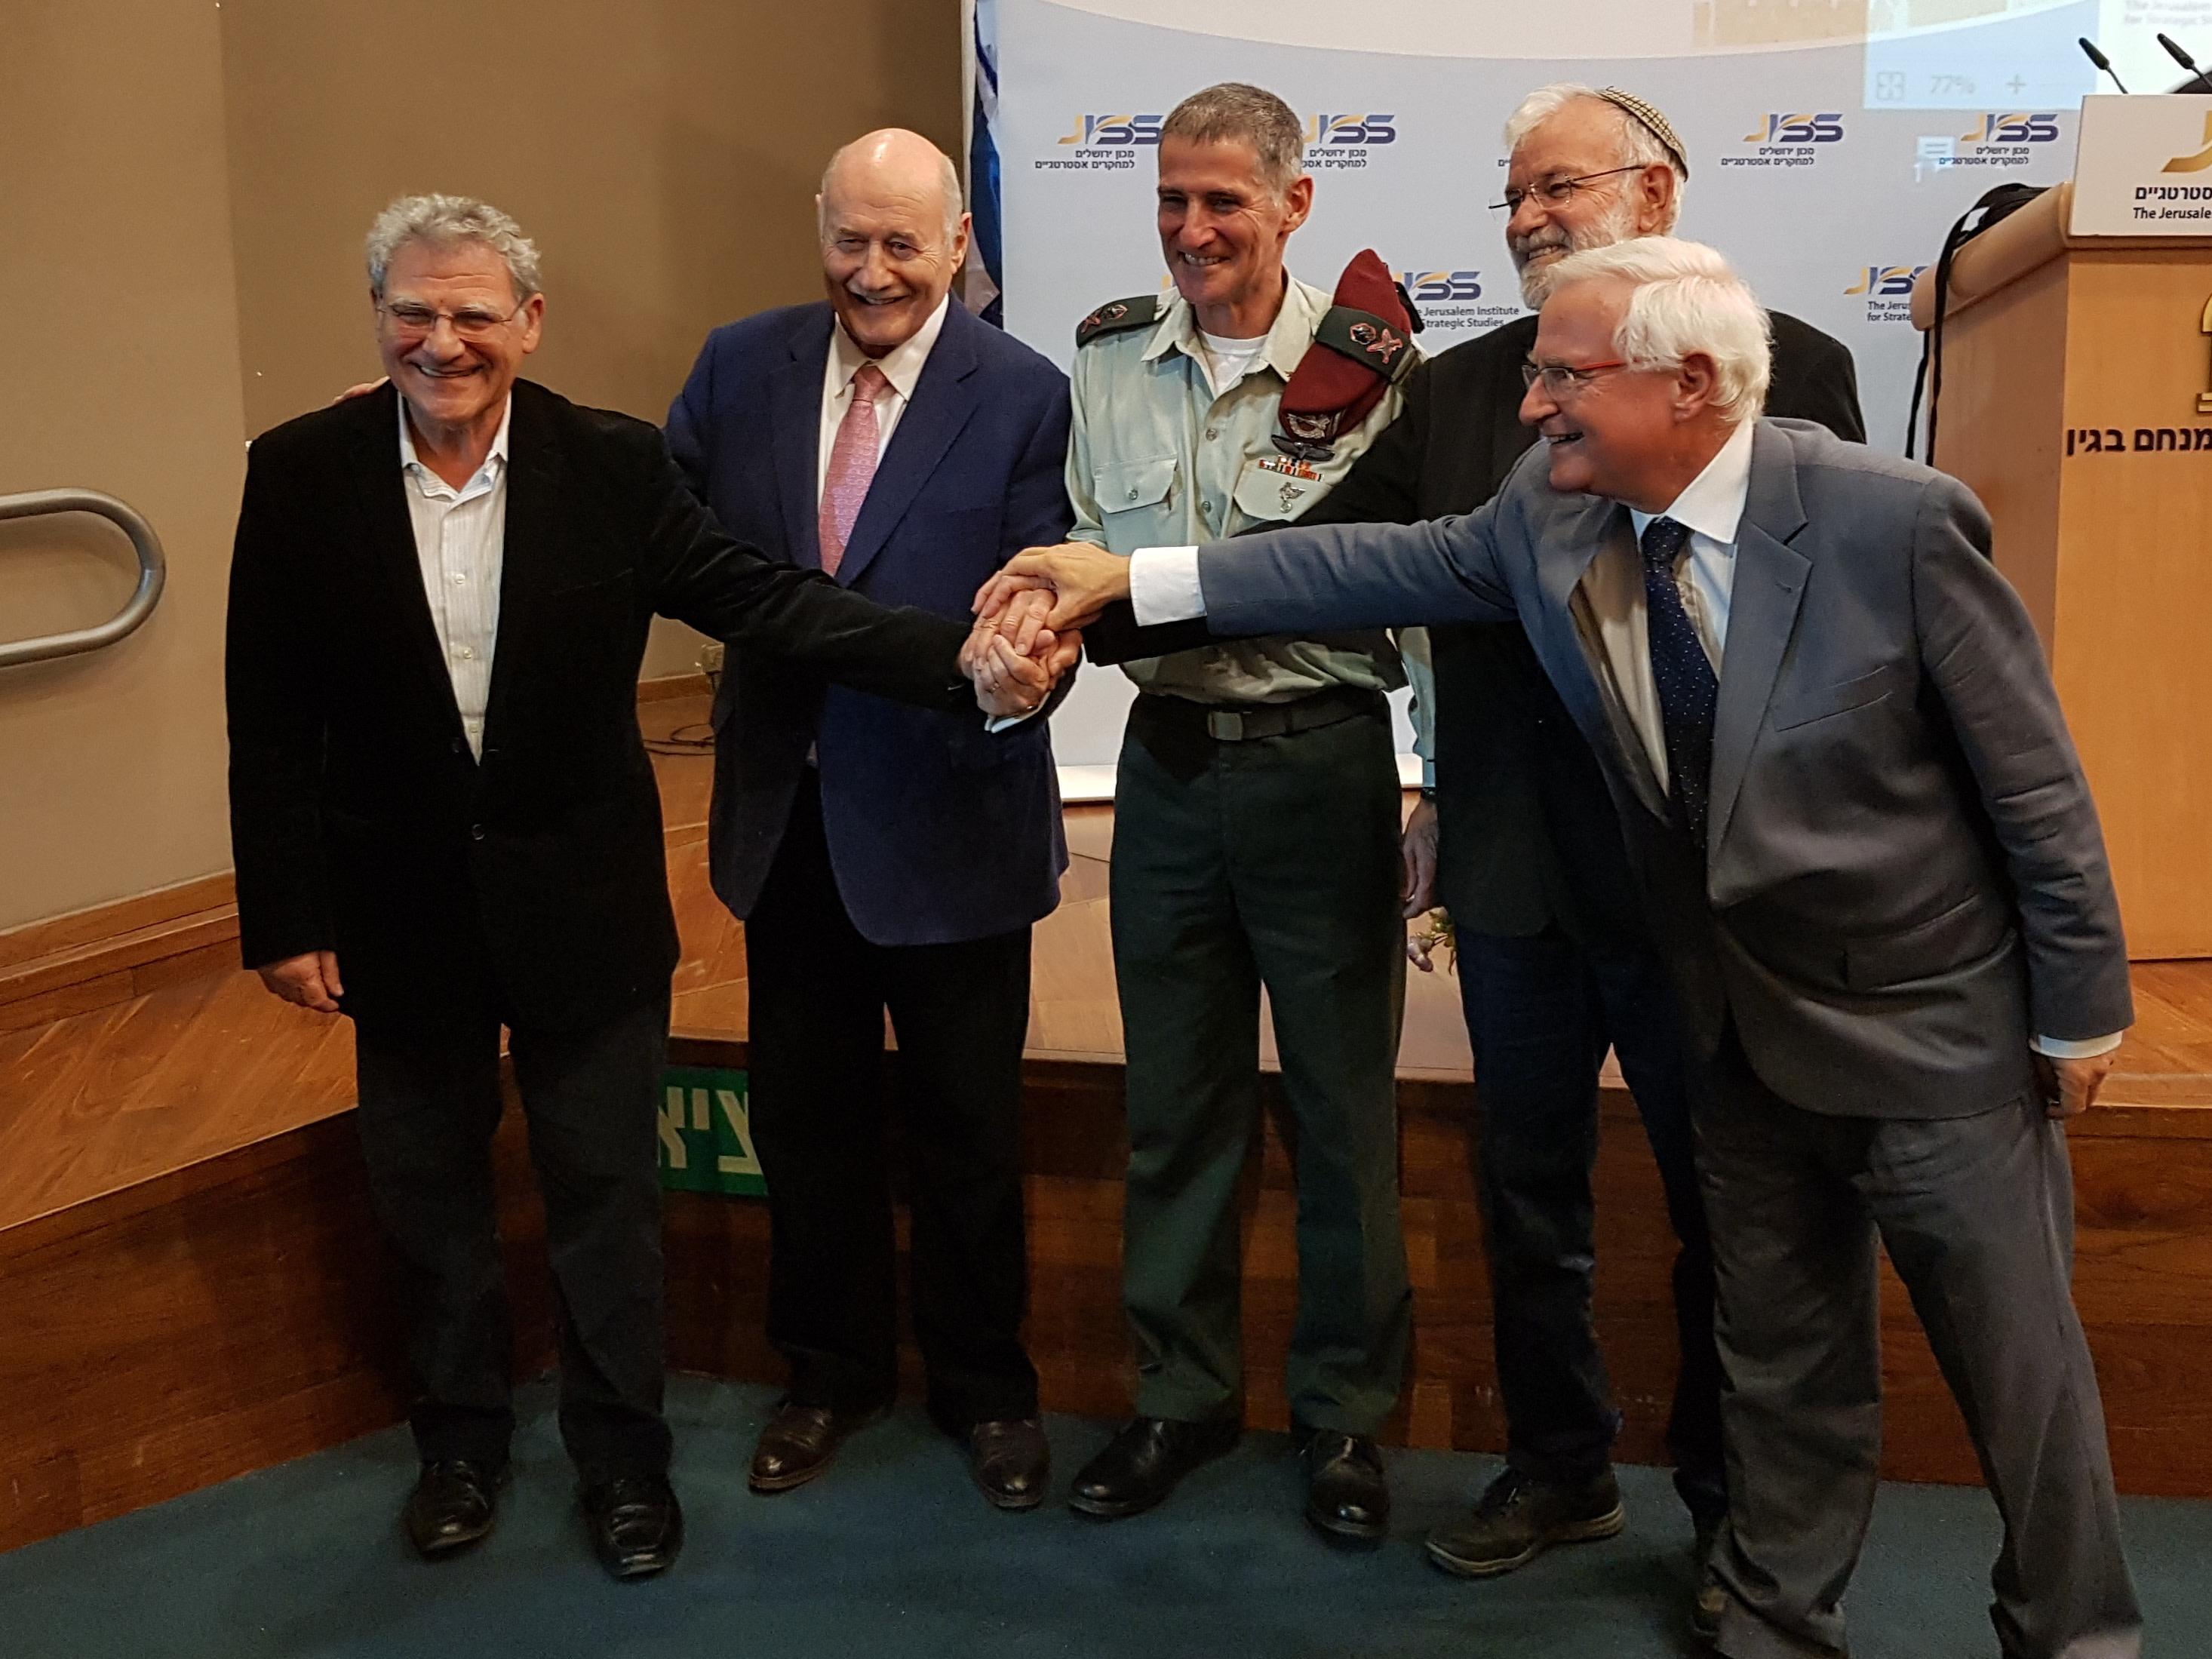 Left to right: Efraim Inbar, Greg Rosshandler, Yair Golan, Yaakov Amidror and Eran Lerman (Yonah Jeremy Bob)